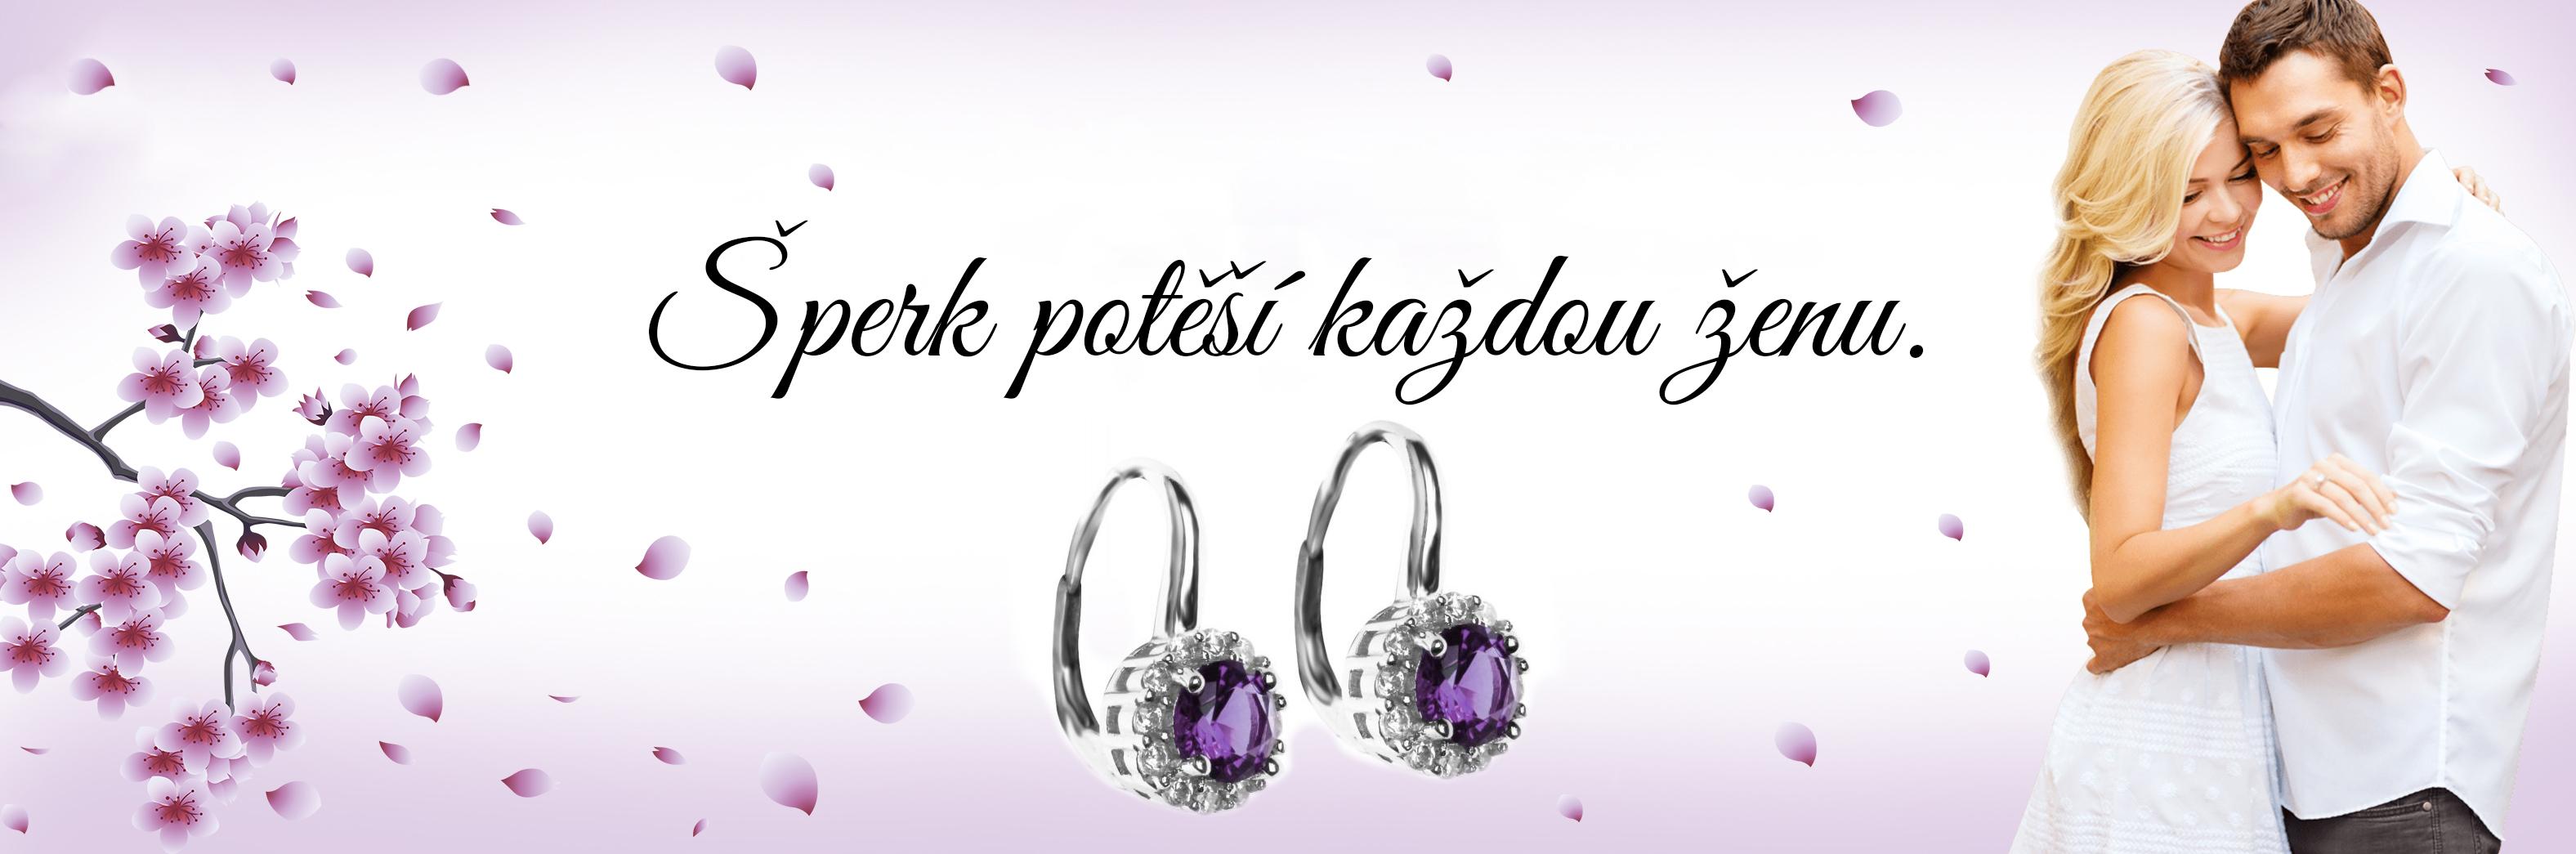 Šperk potěší každou ženu.